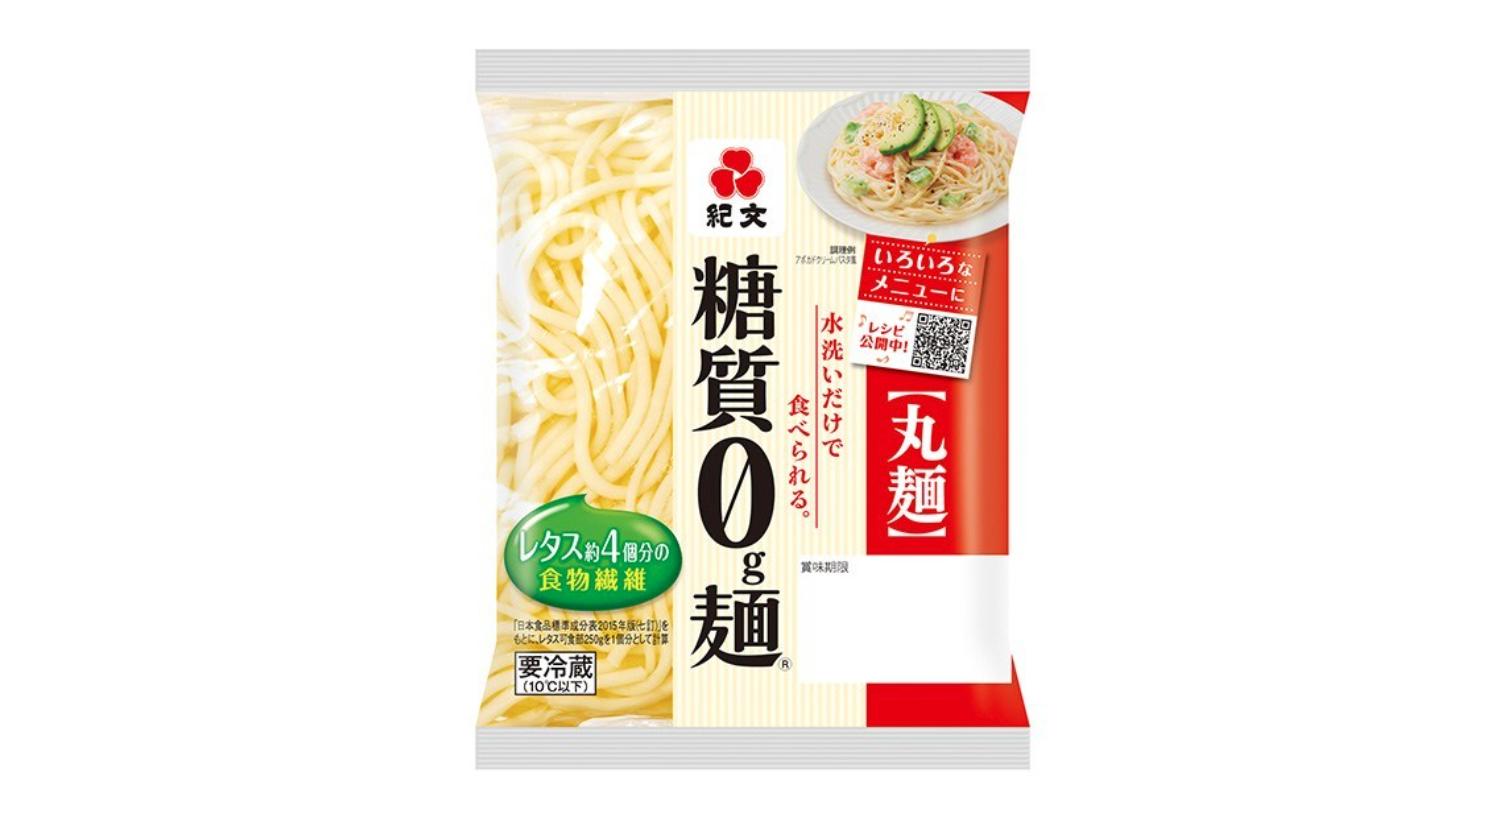 RIZAP_ライザップ_食事制限_メニュー_糖質0麺